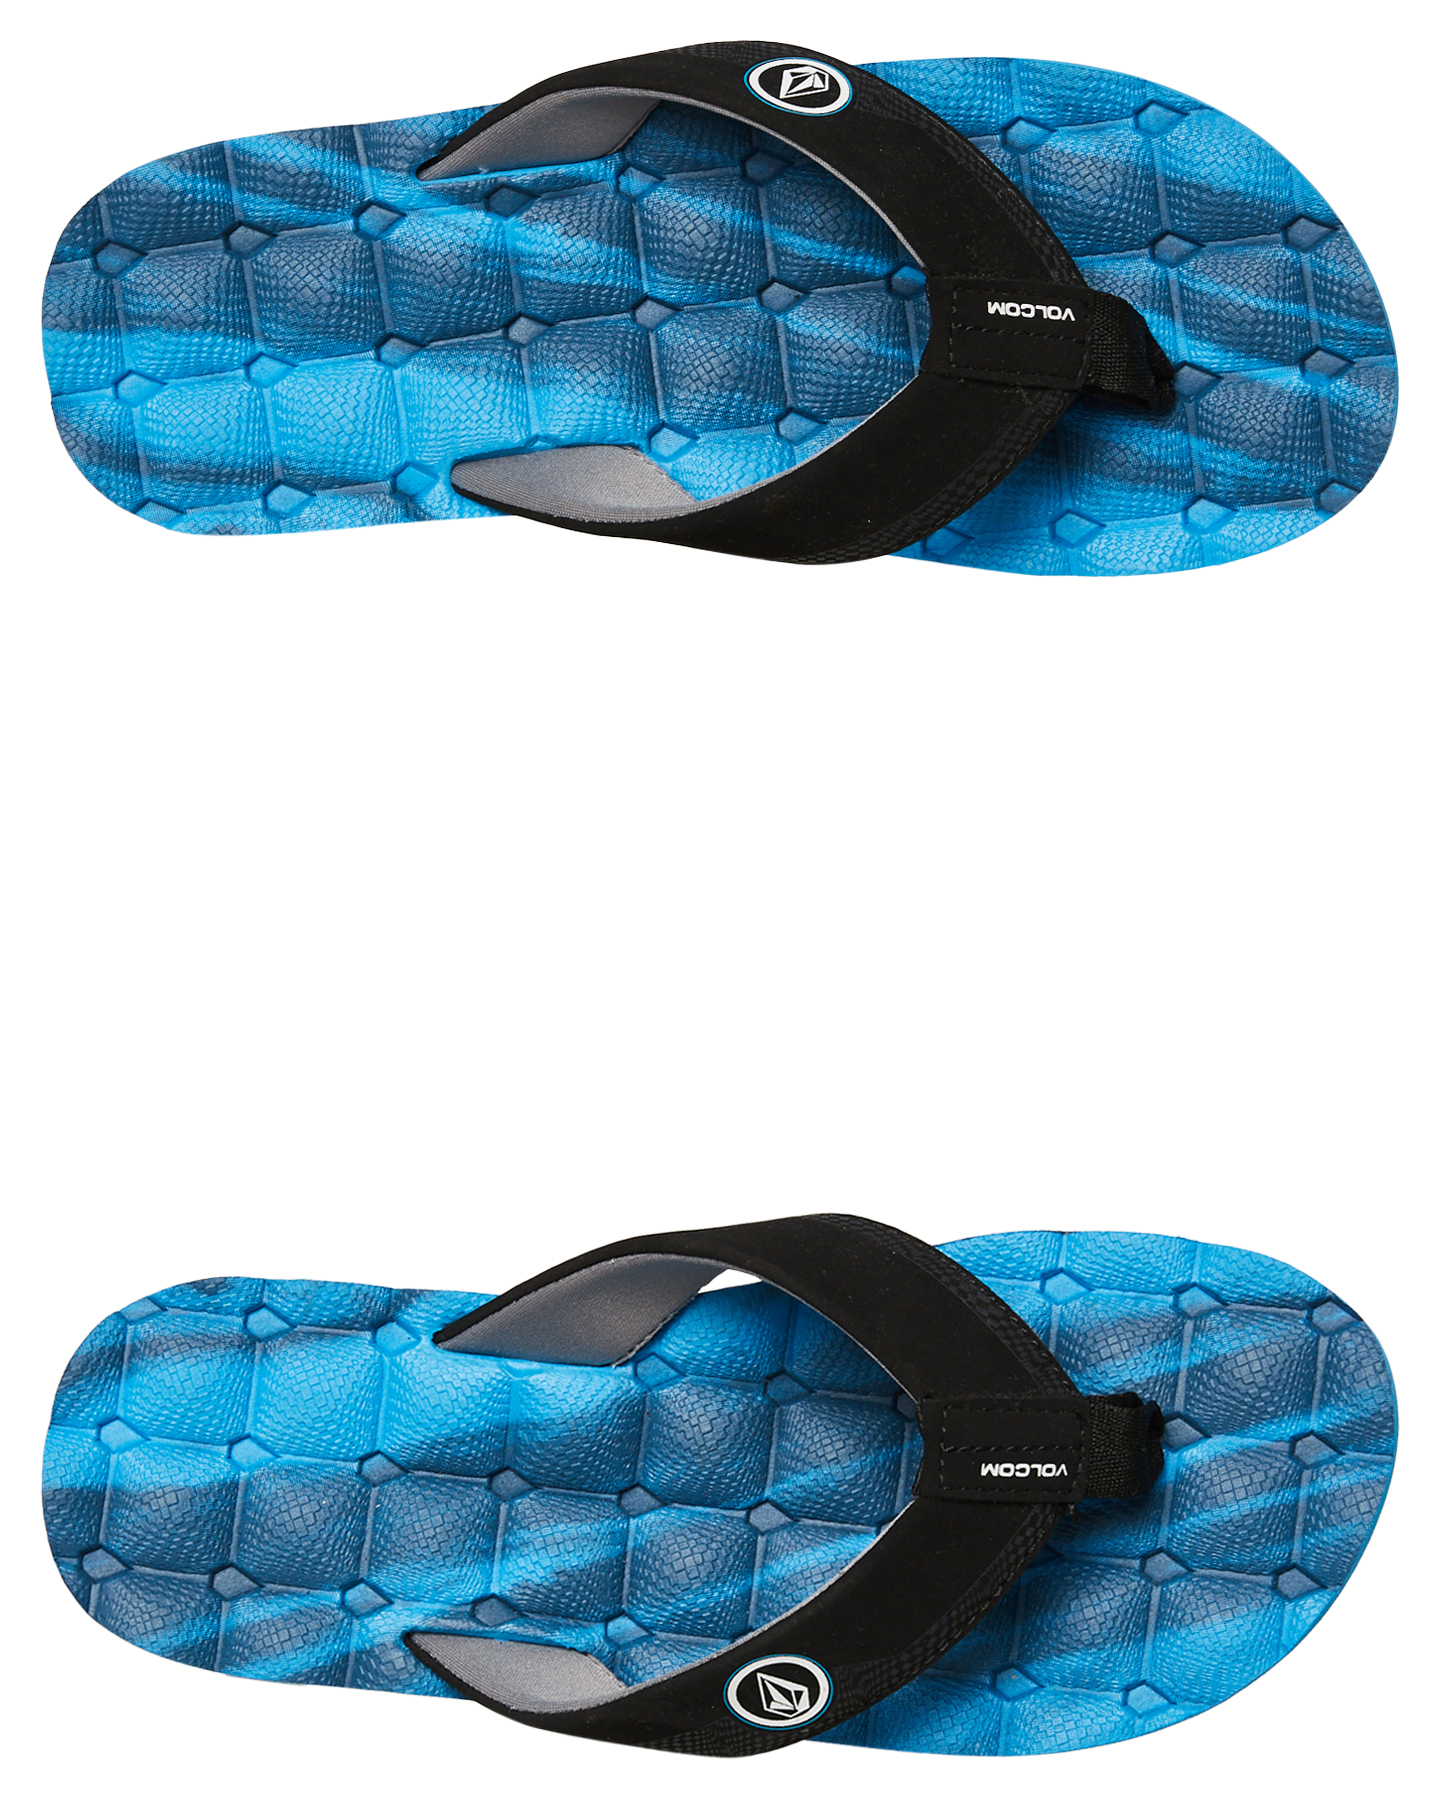 New Volcom Boy/'s Recliner Sandal Marina Blue